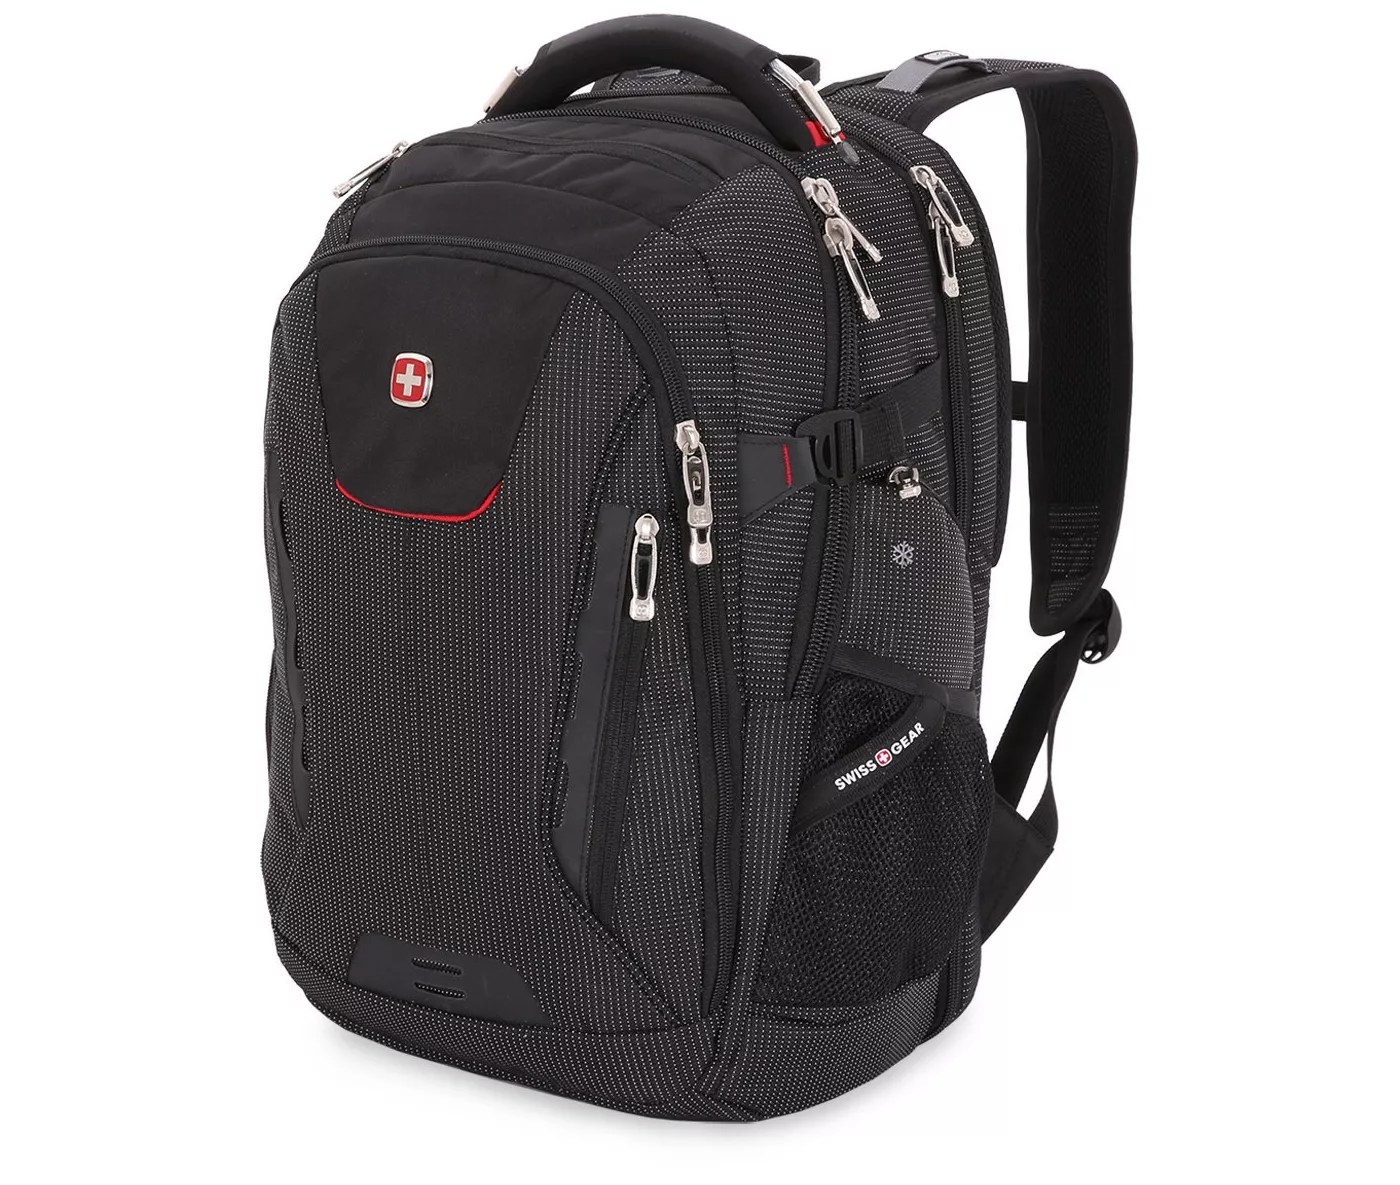 The black Swissgear backpack